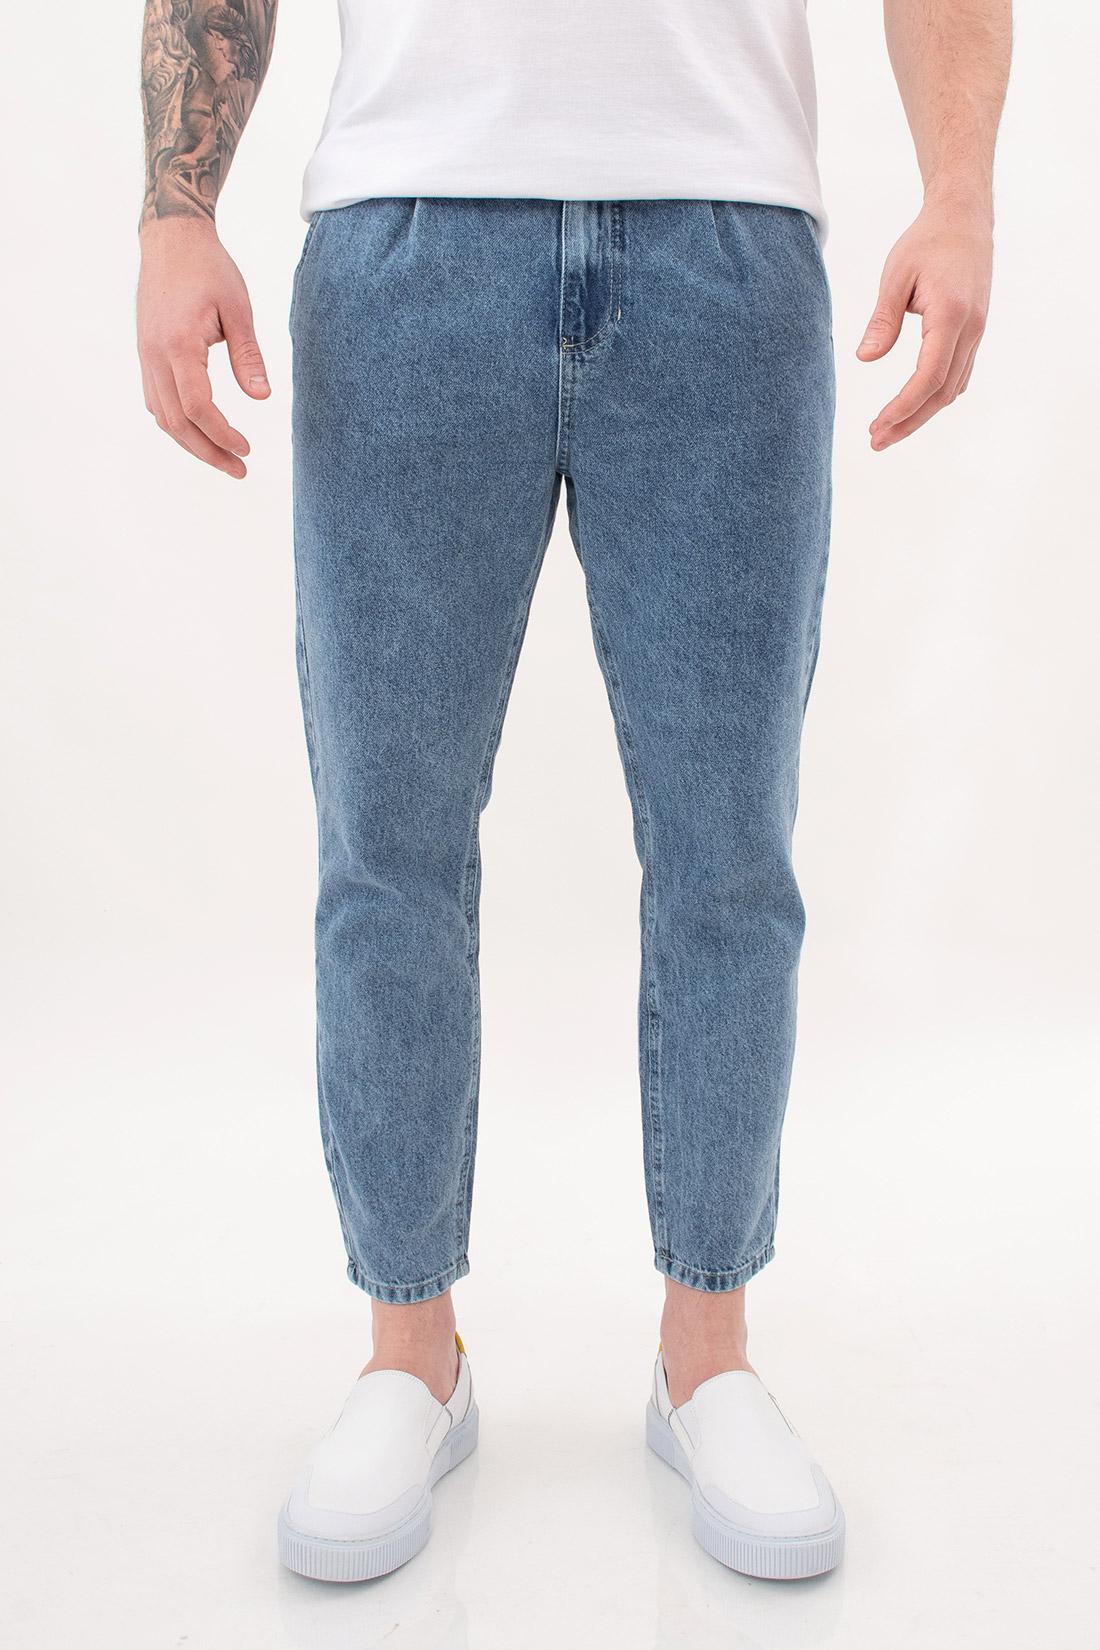 Calca Jeans Hering Taper